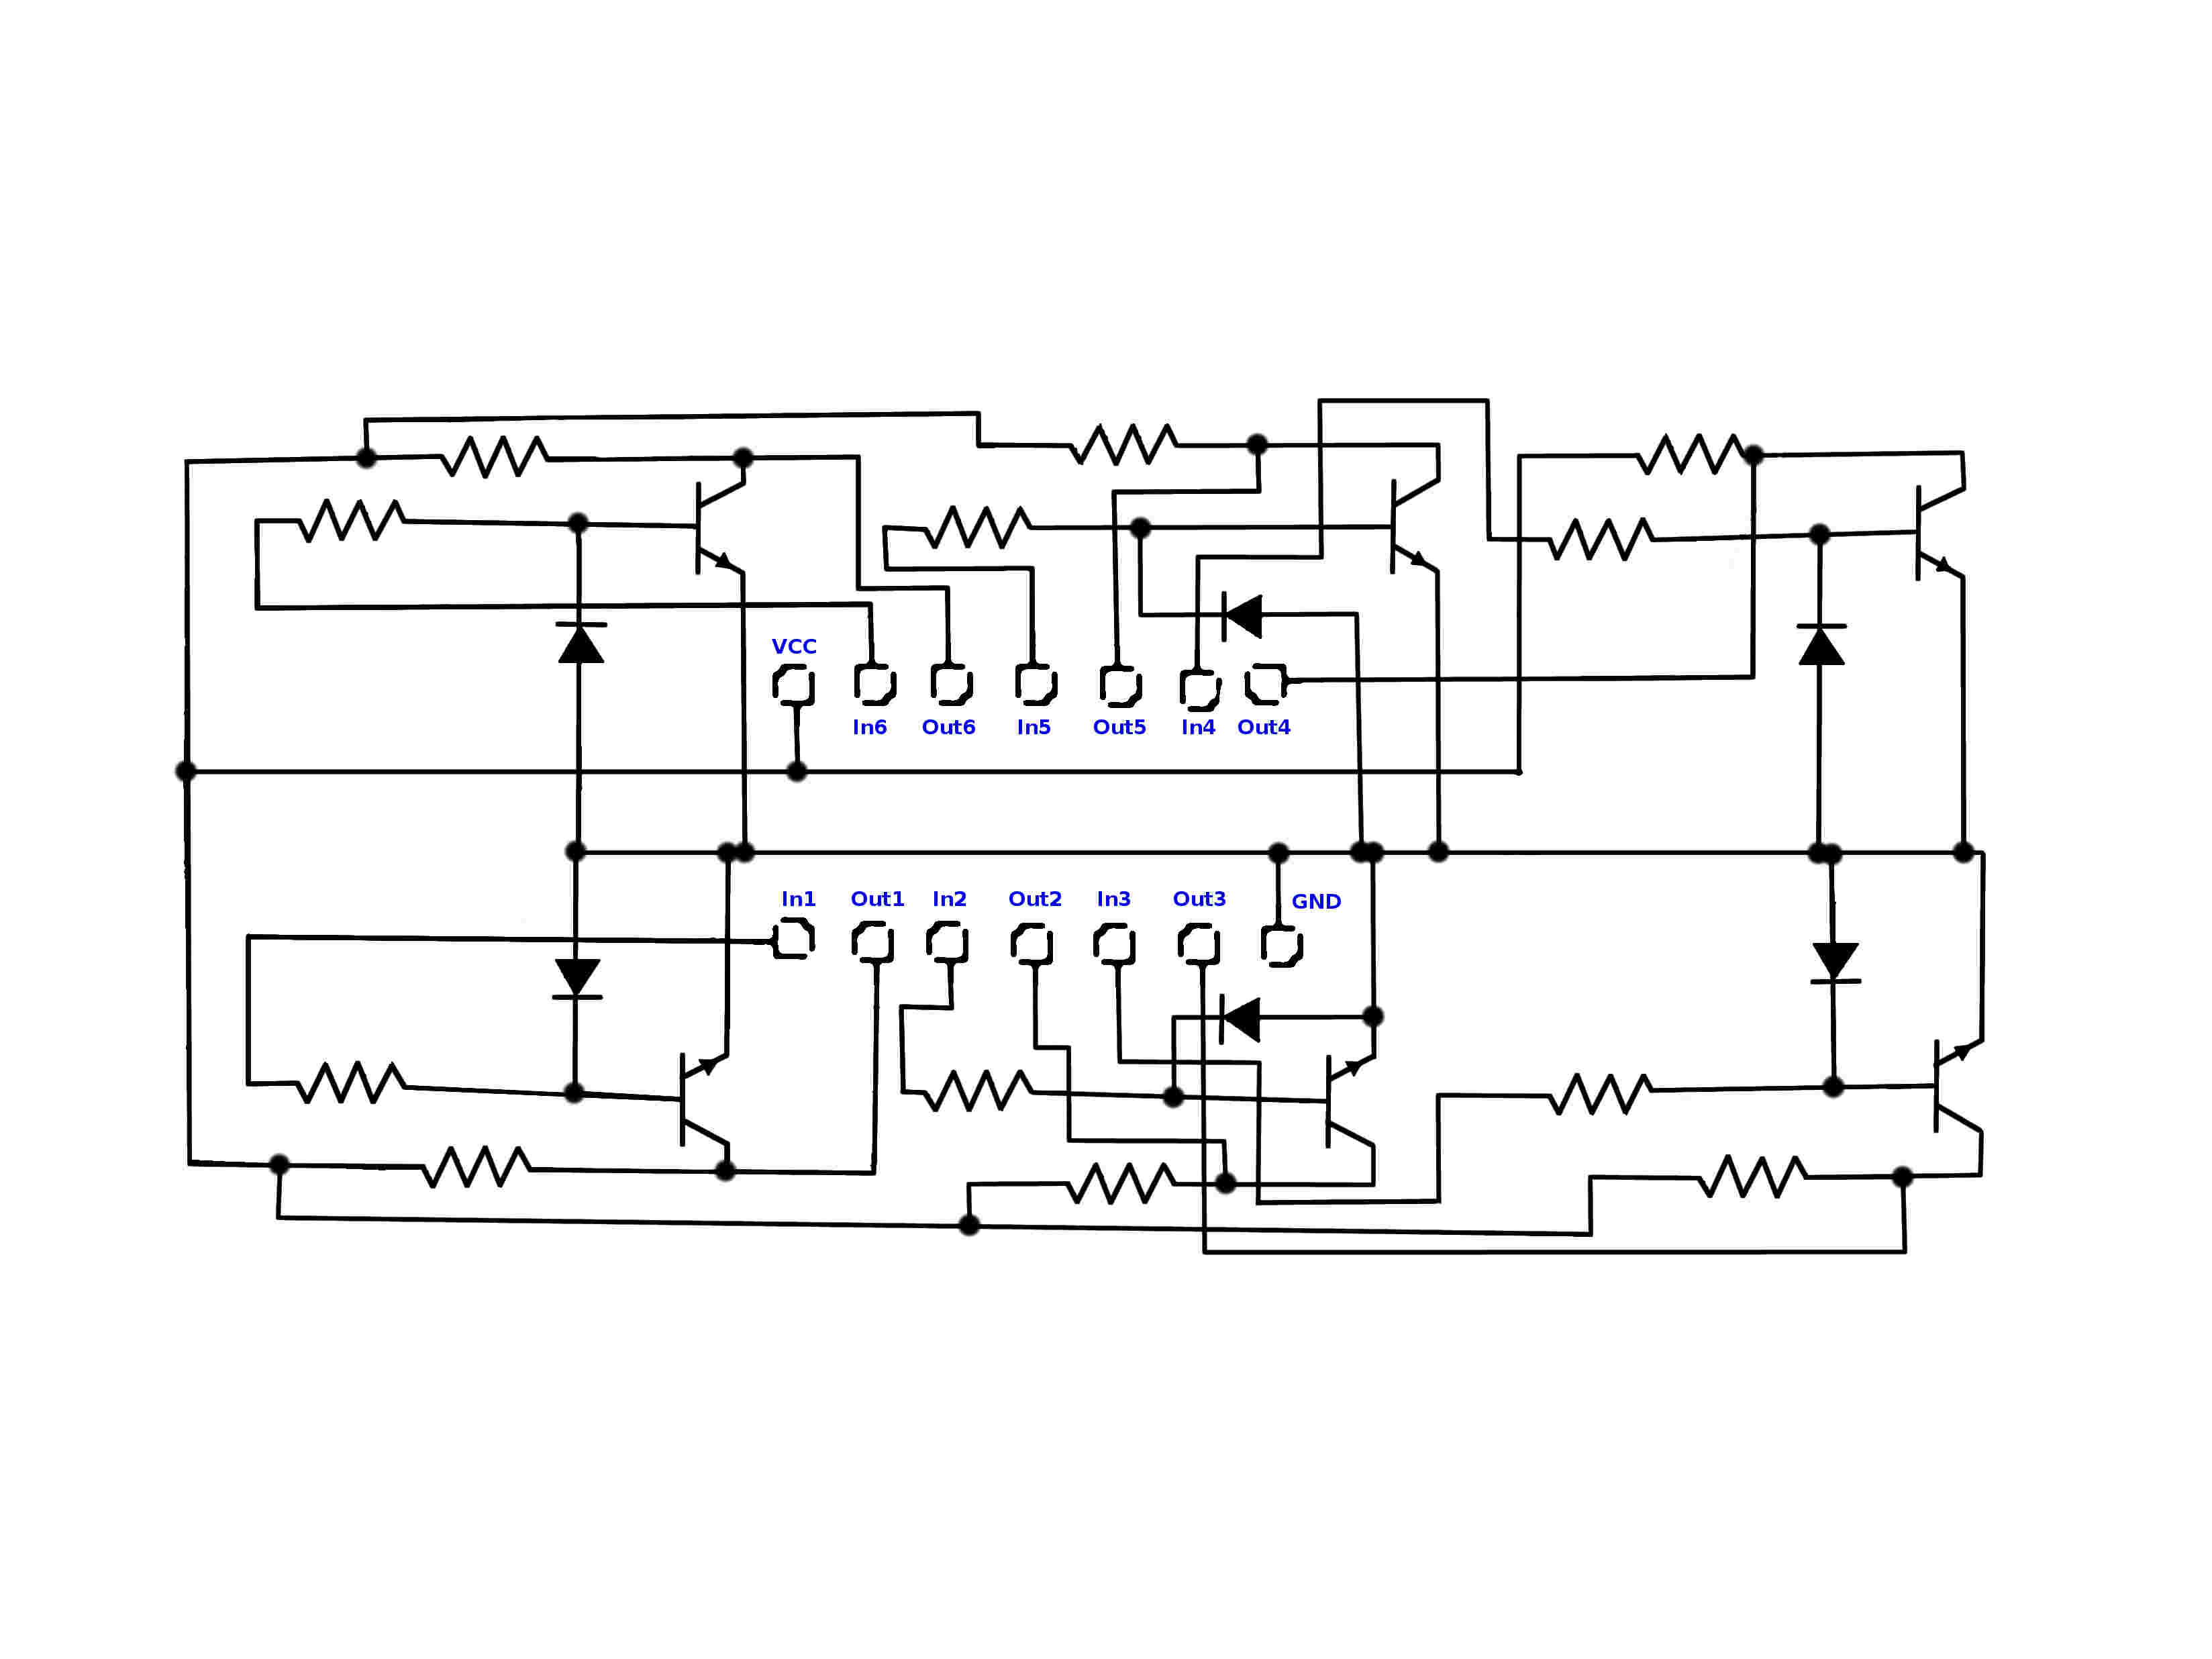 7404 gate diagram lift gate wiring diagram logic buffers « benningtons.net